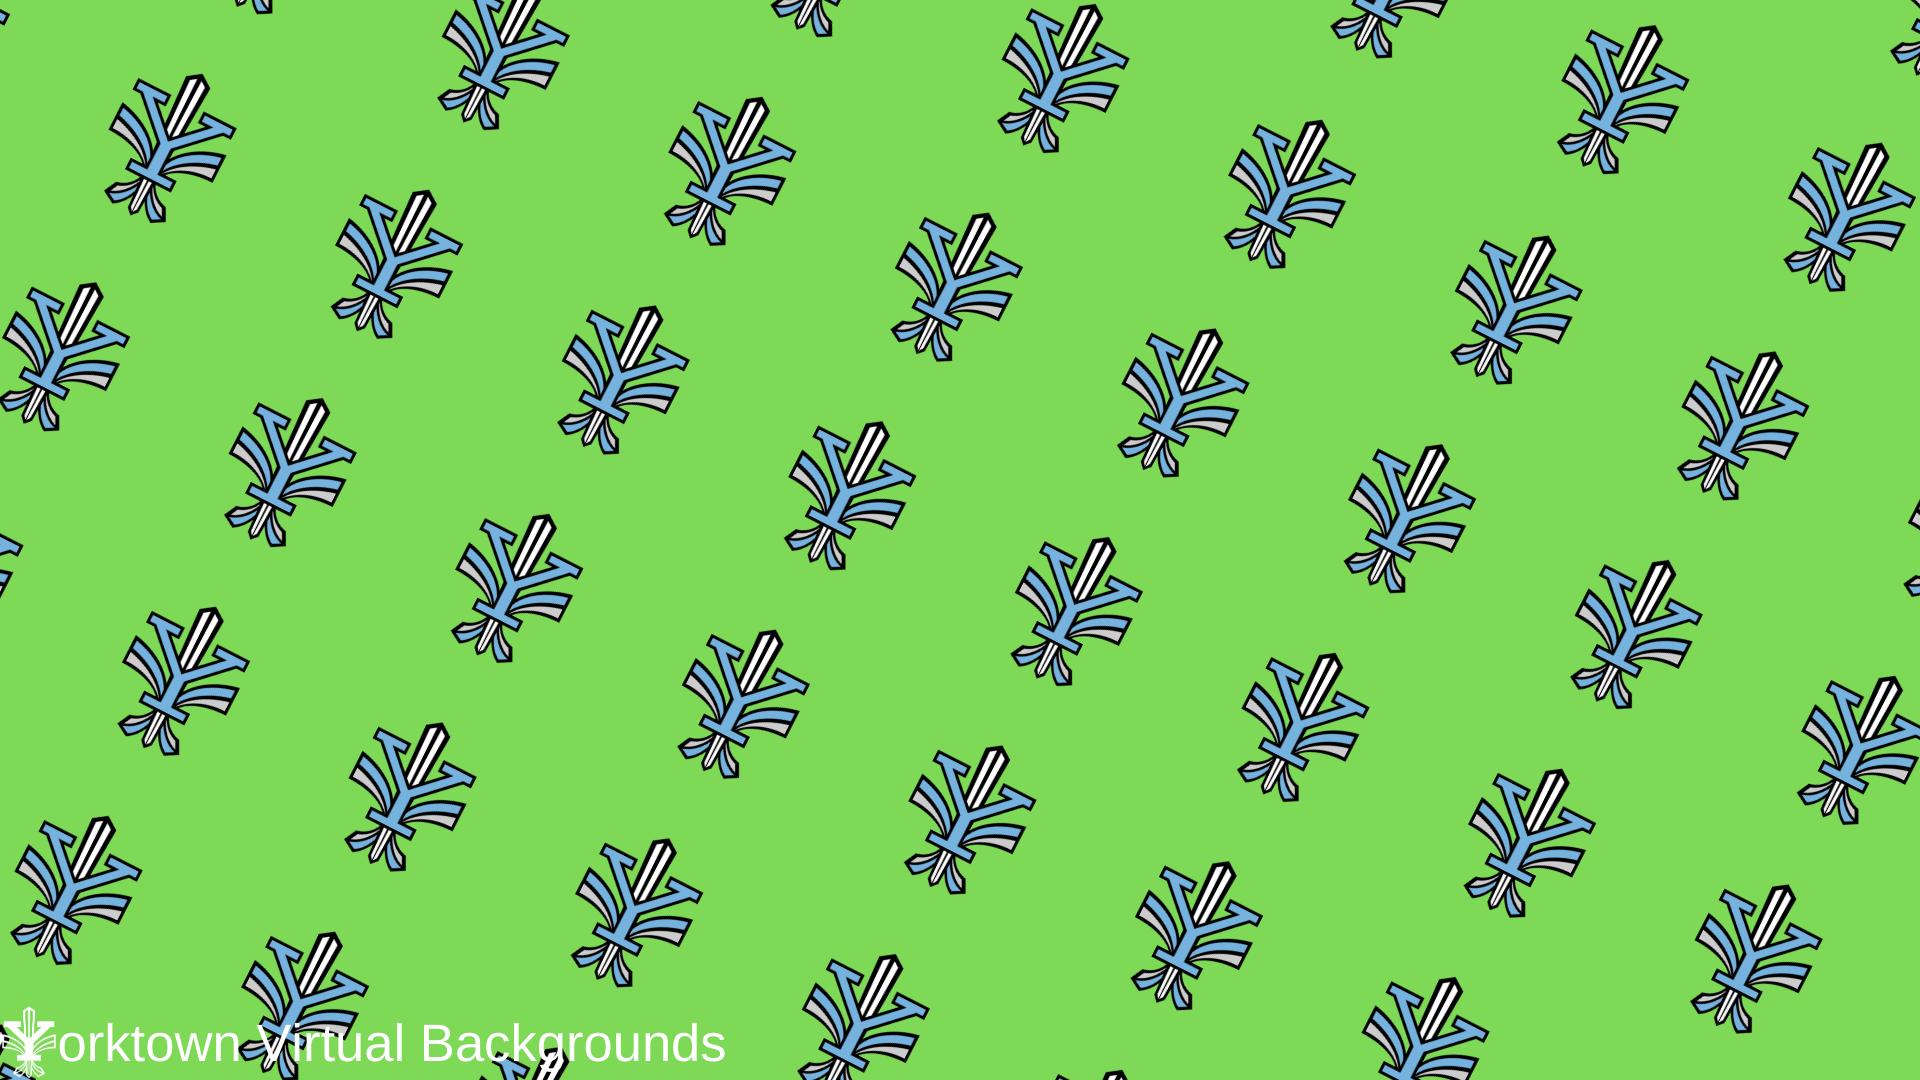 Yorktown Logo Wallpaper for Teams - Green - Diagonal